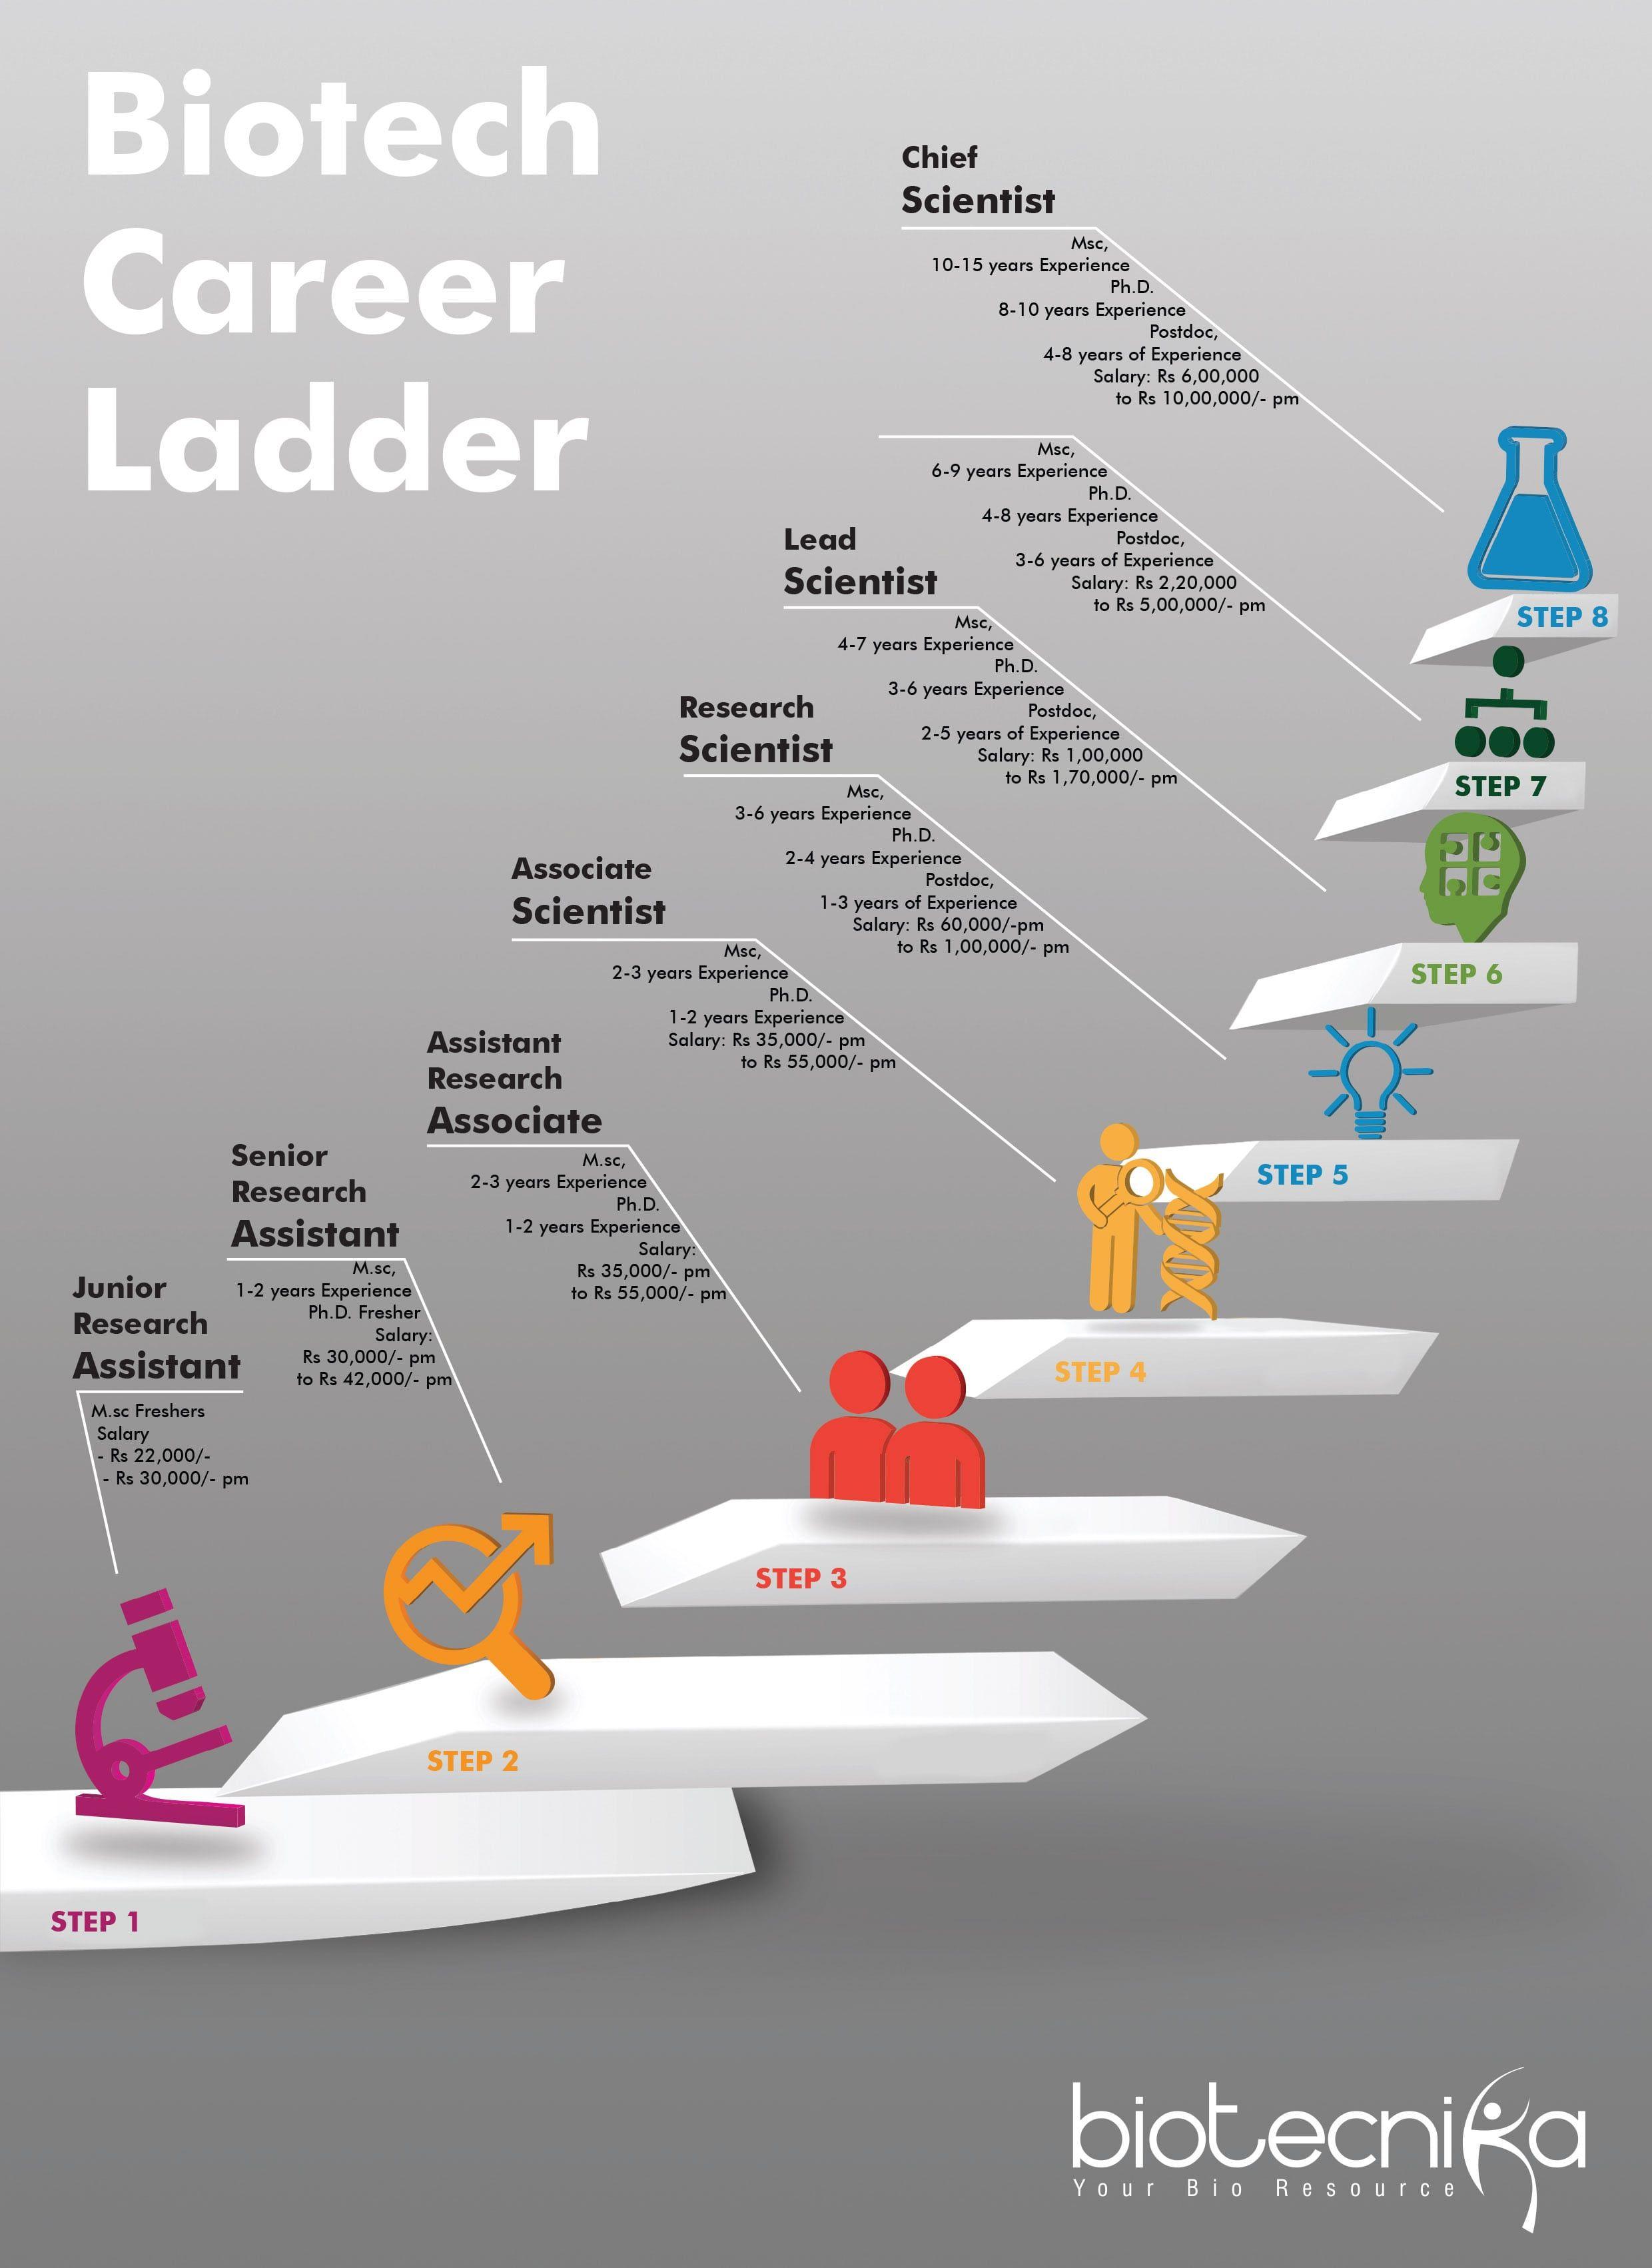 Biotech Career Ladder Biotech Job Positions Salary Details